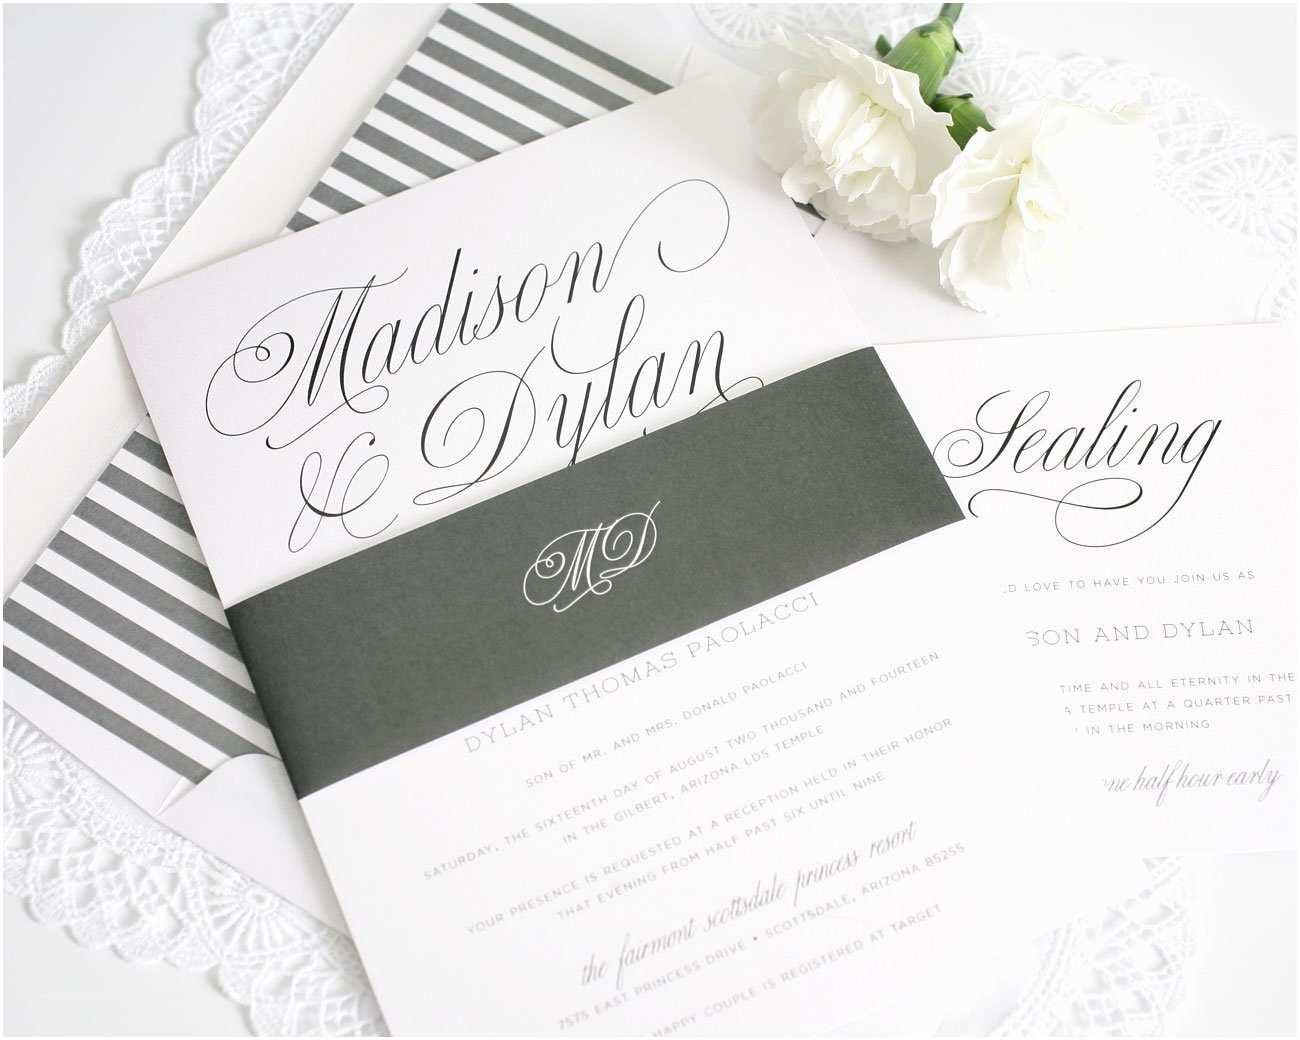 Outdoor Wedding Invitations Romantic Wedding Invitations In Charcoal